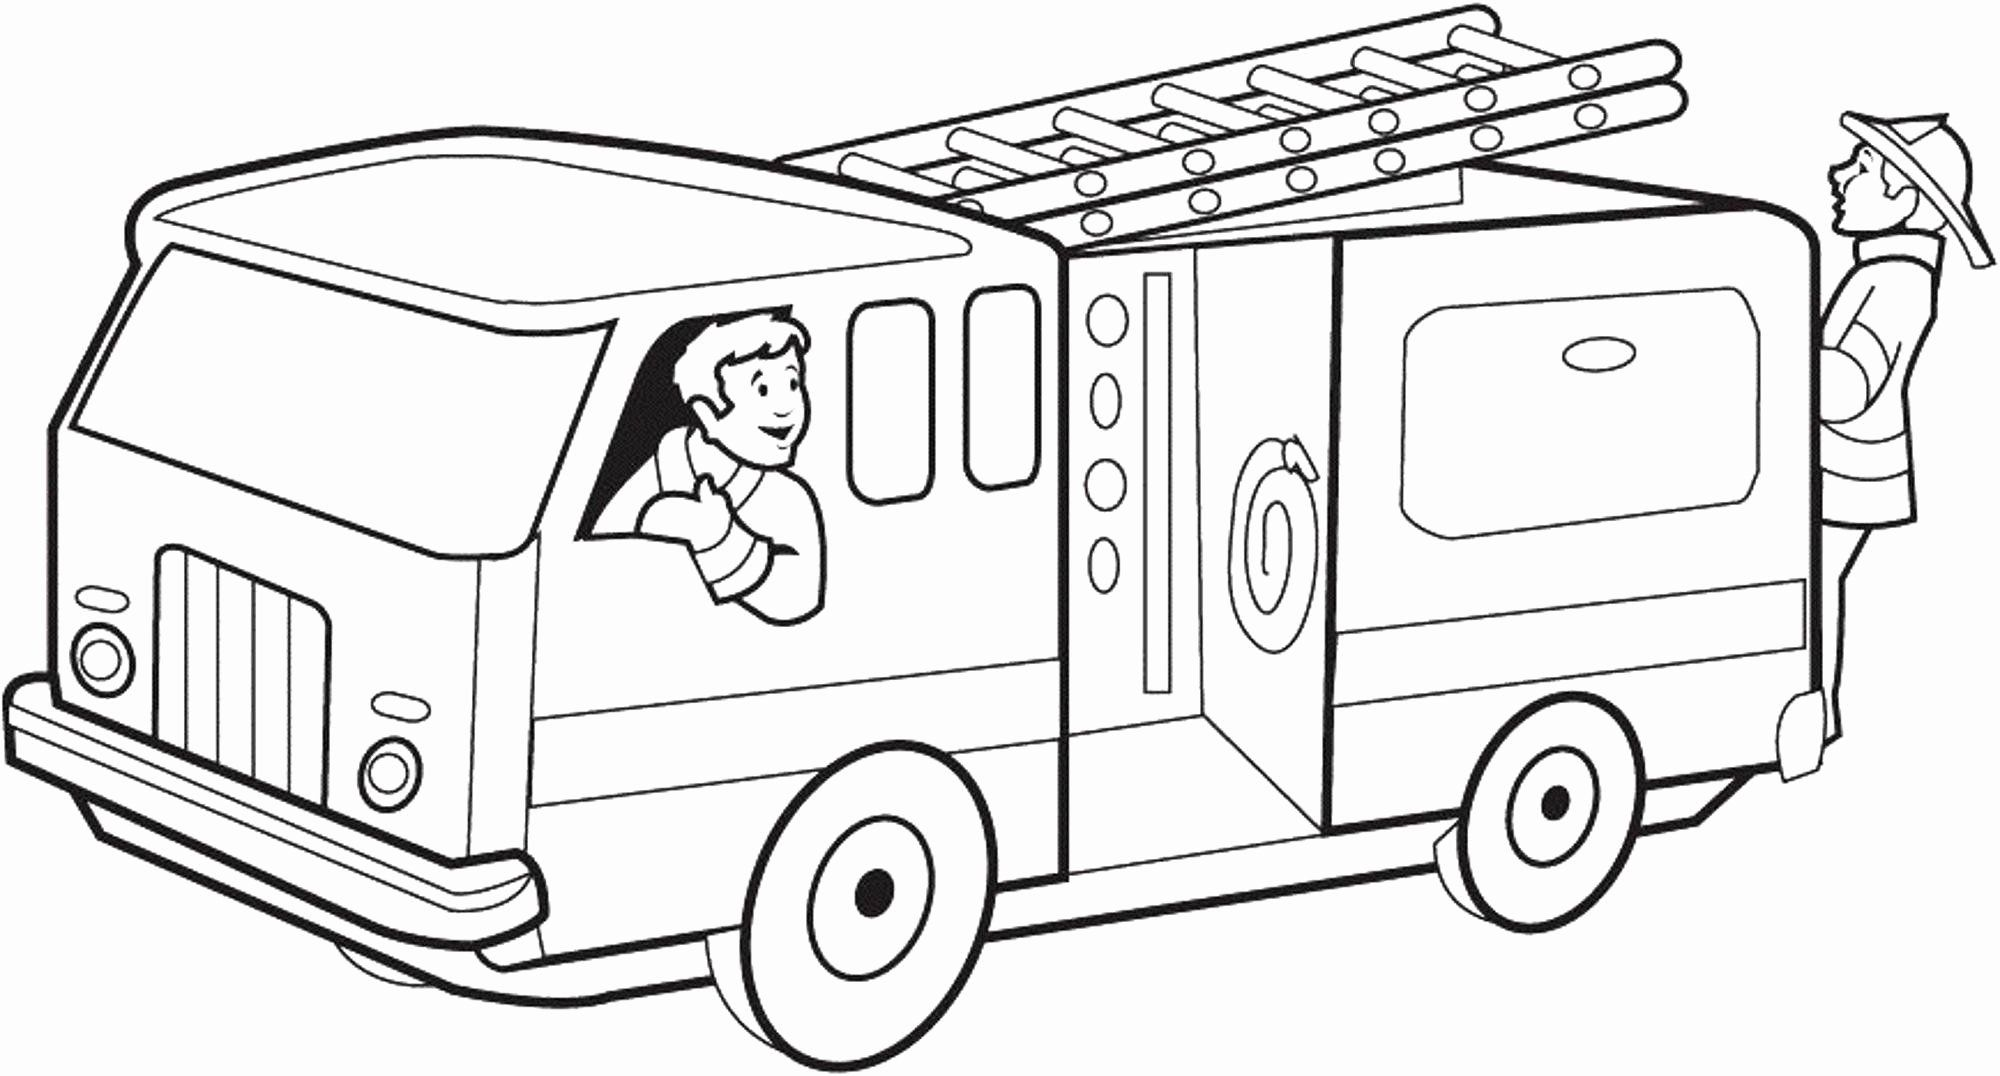 Printable Fire Truck Coloring Page New Fire Trucks Coloring Page Itfaiye Arabasi Boyama Kagidi Okul Oncesi